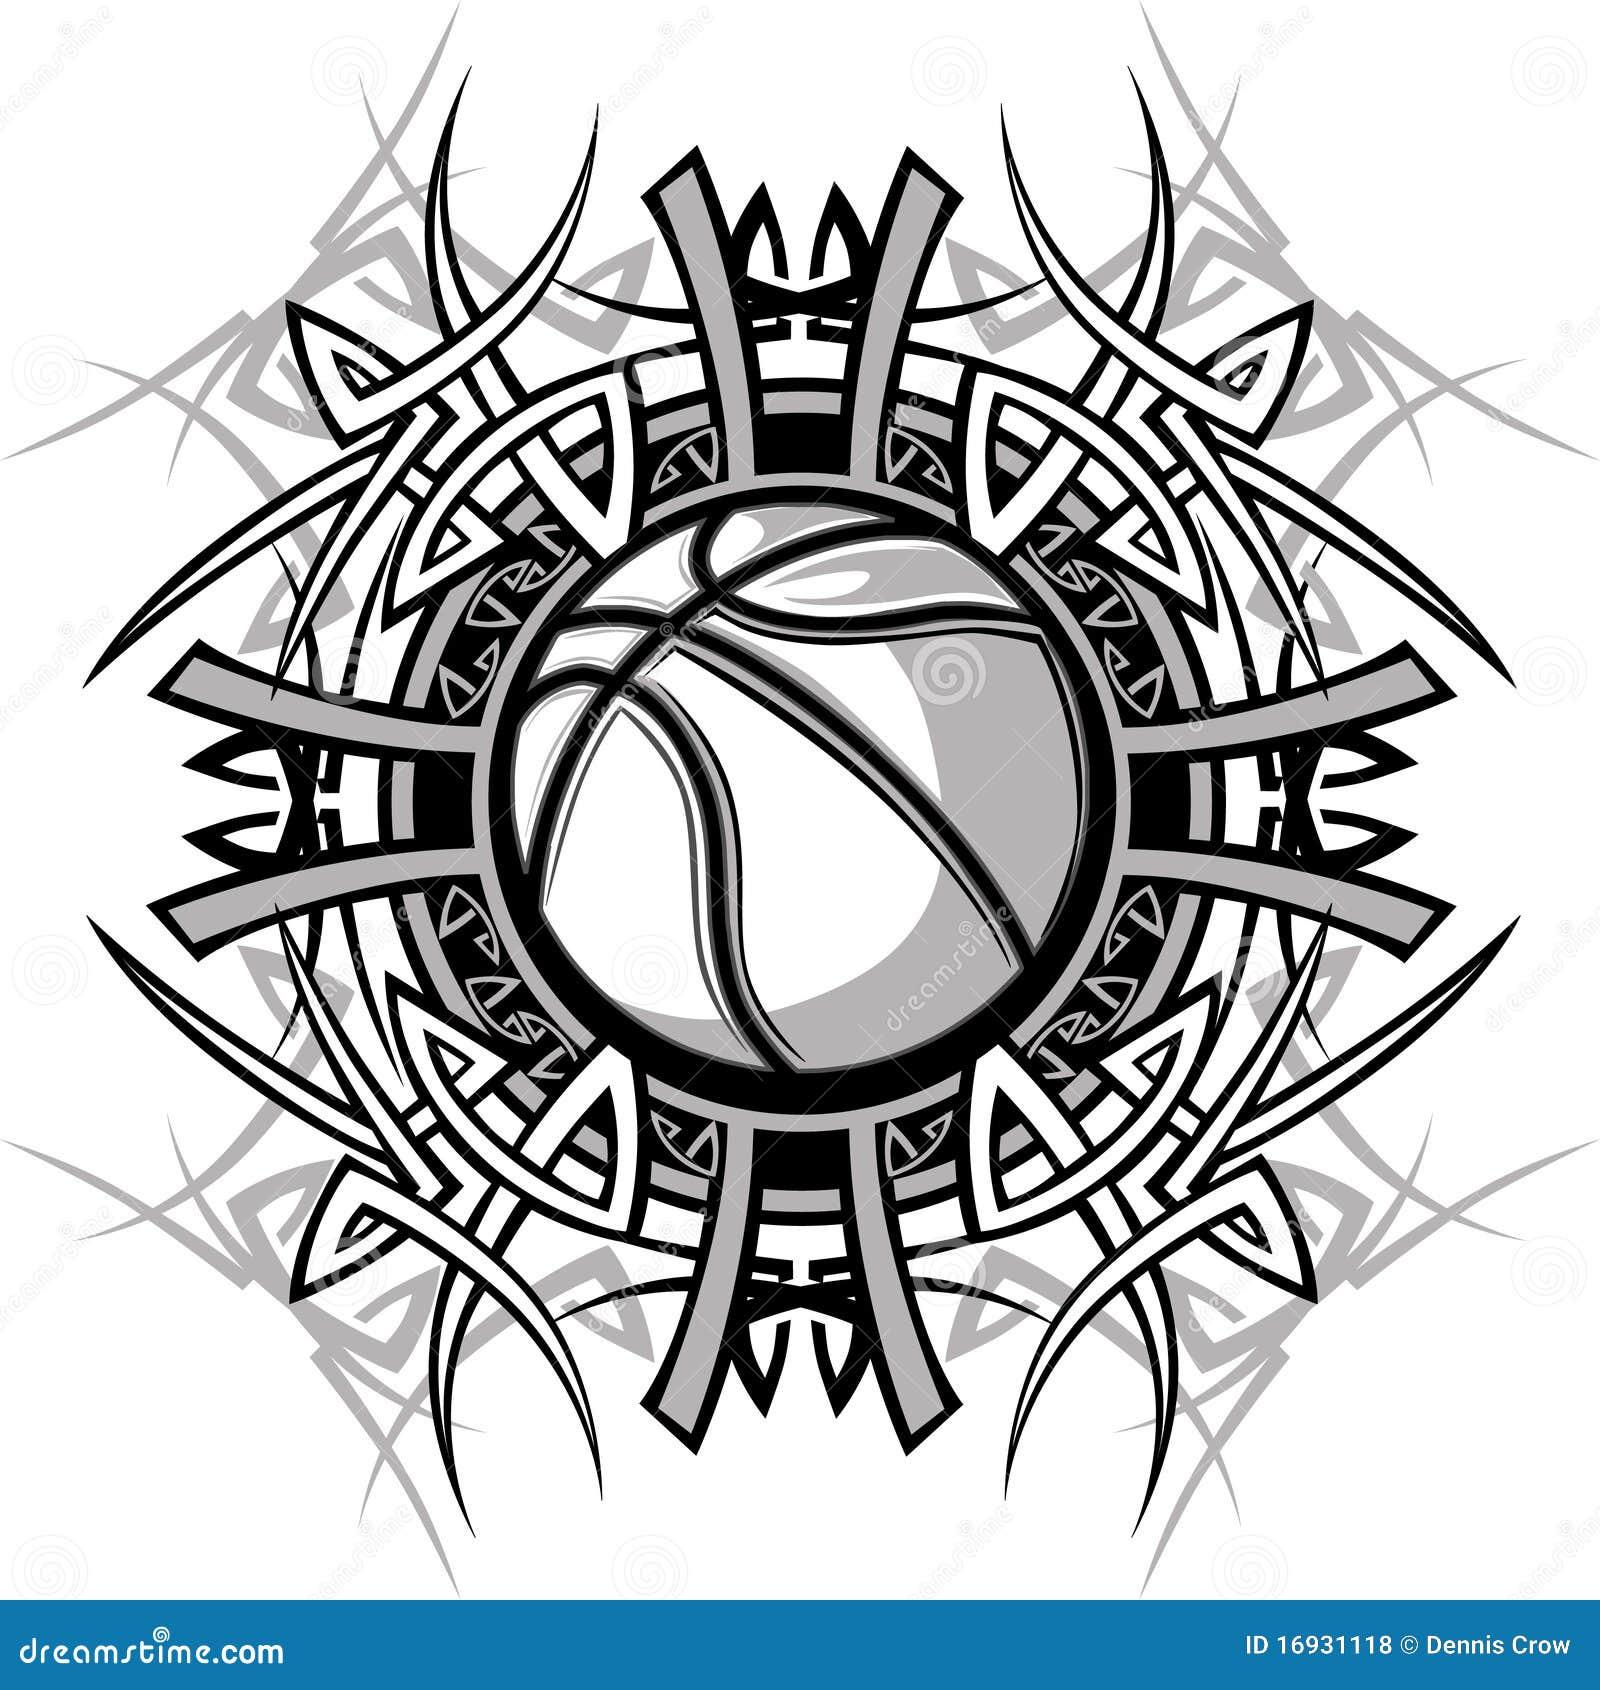 soccer ball tattoo designs for girls